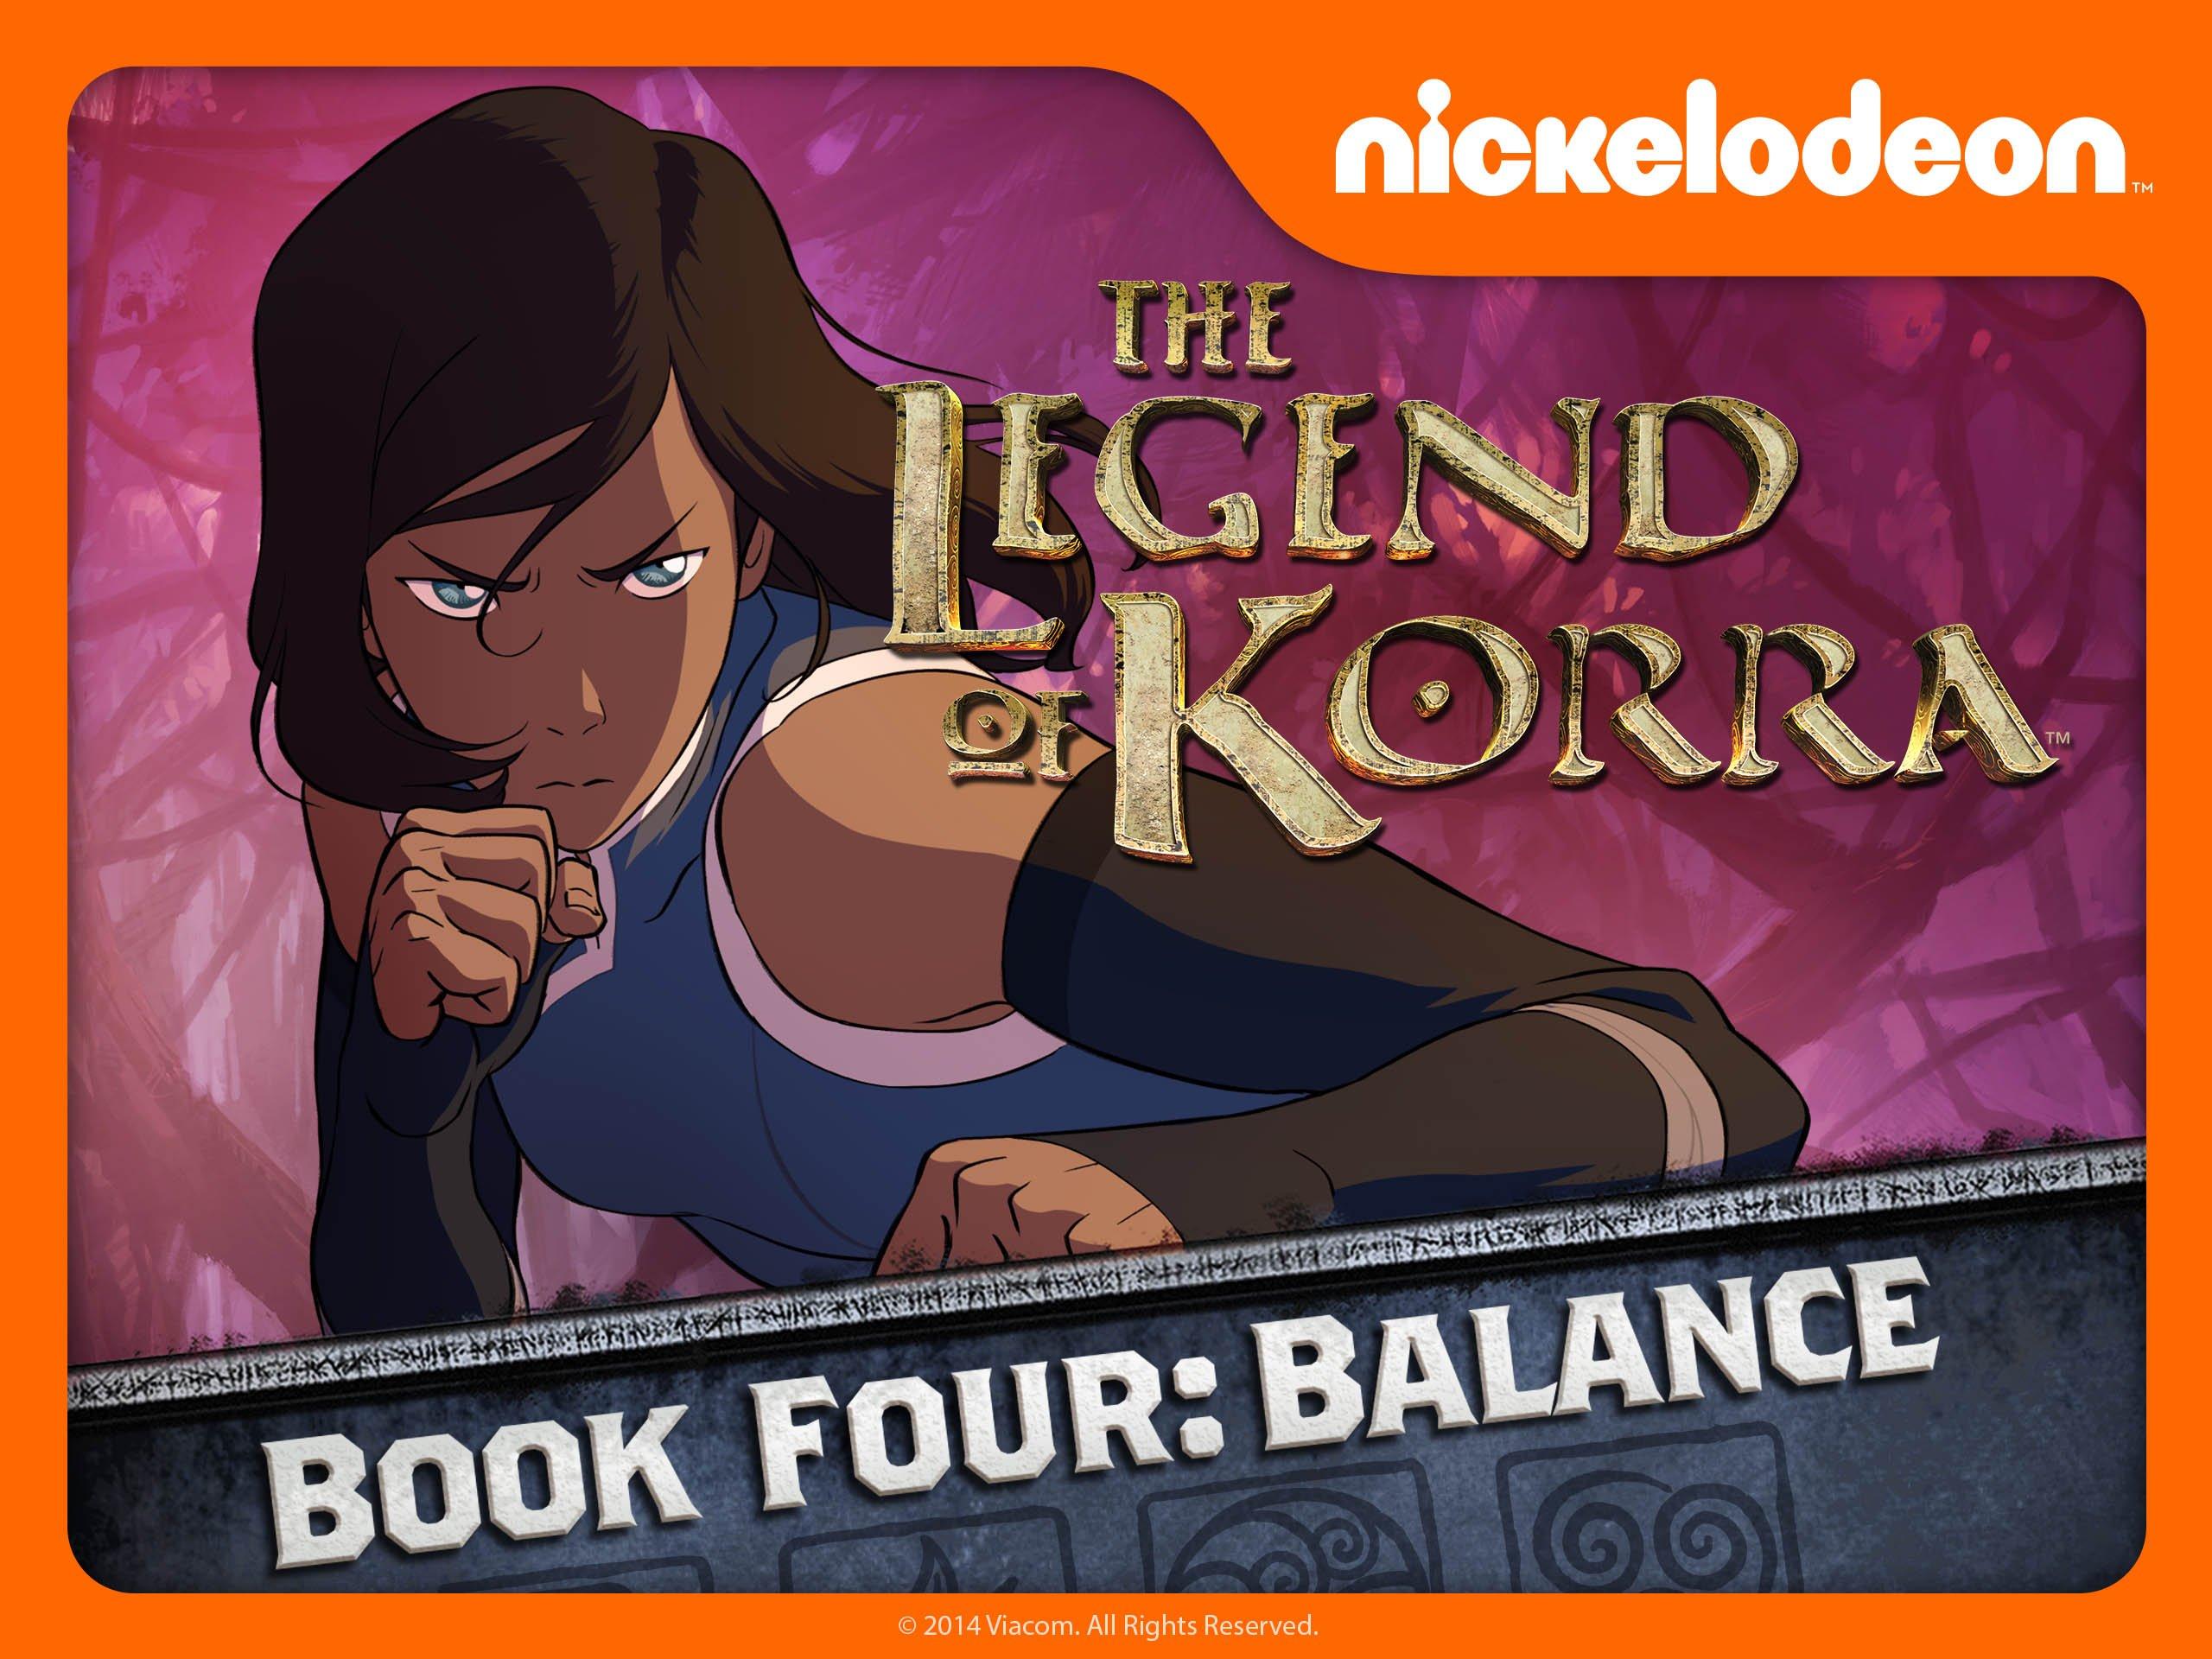 Episode 4 the legend 6 of book korra